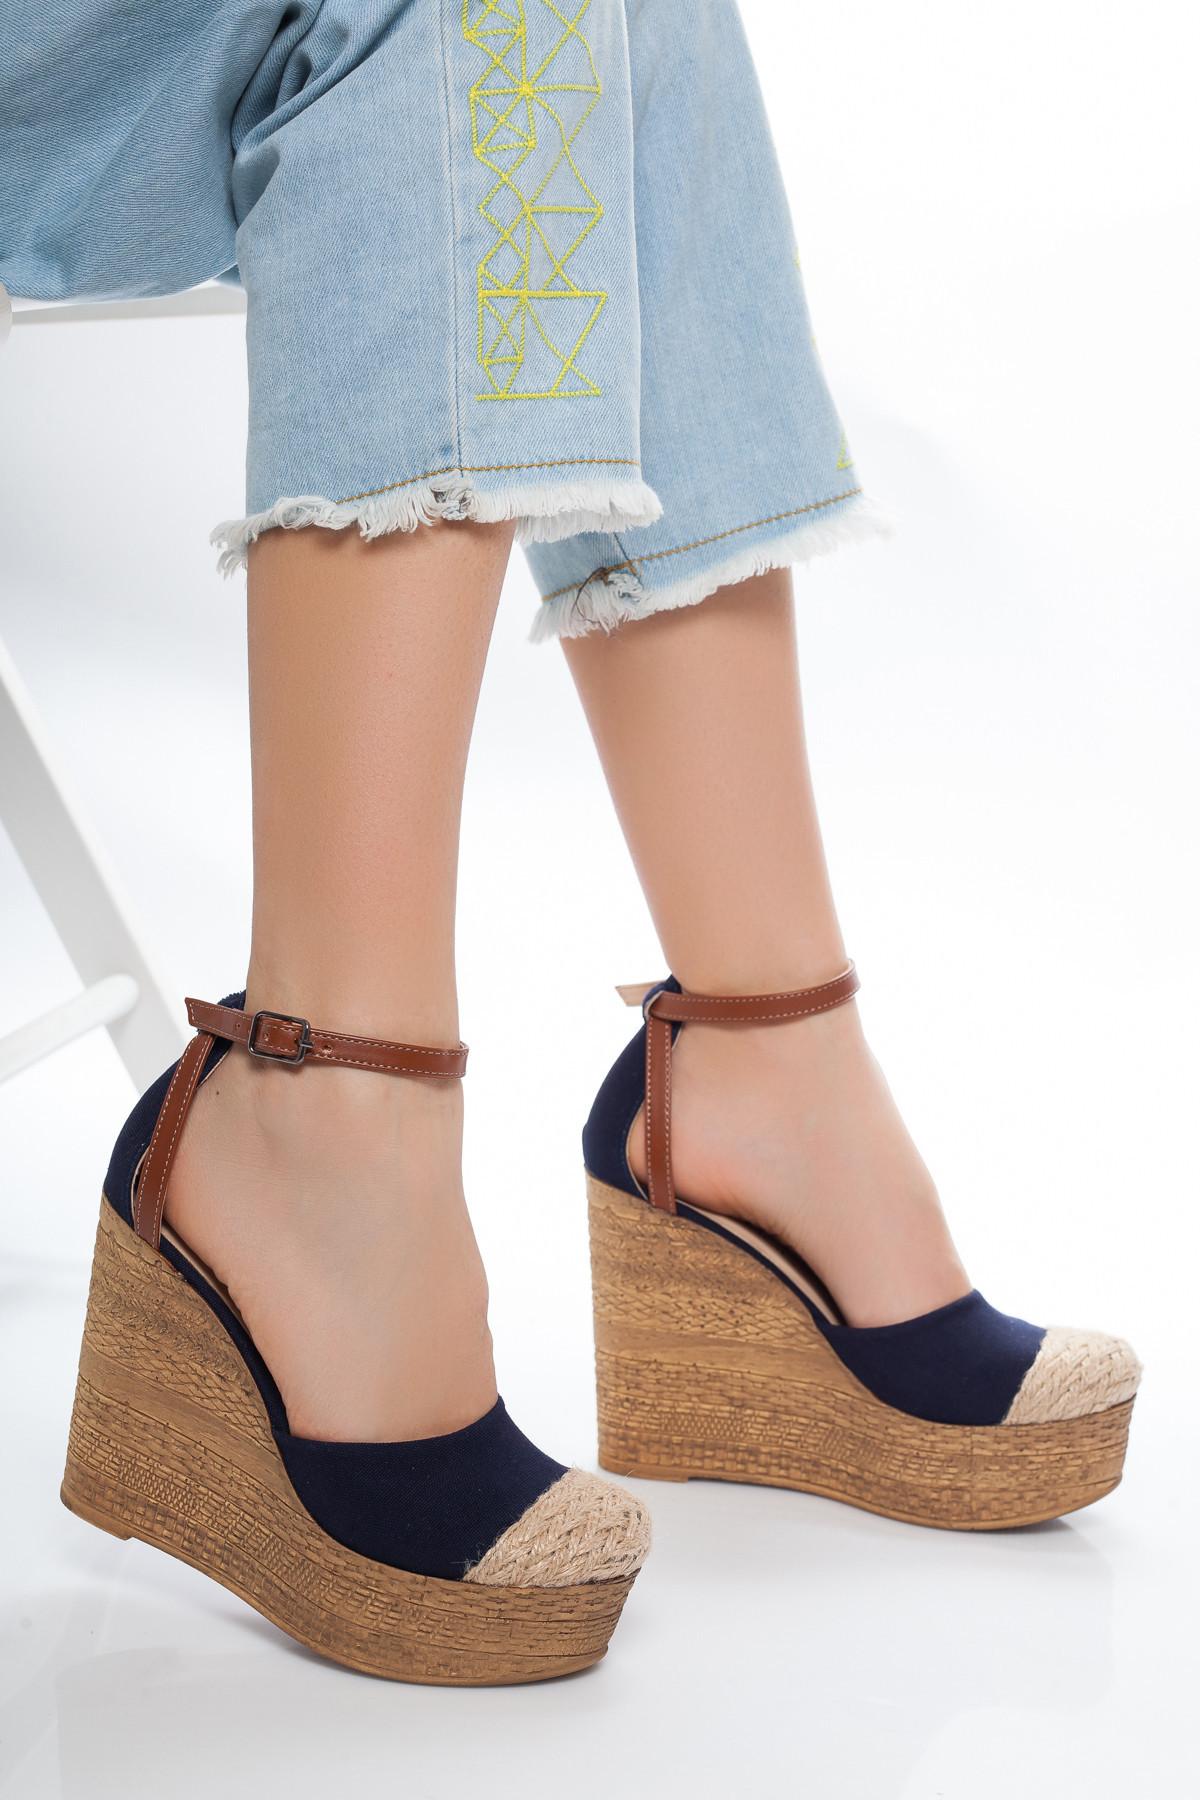 Hasır Detaylı Lacivert Dolgu Topuklu Sandalet